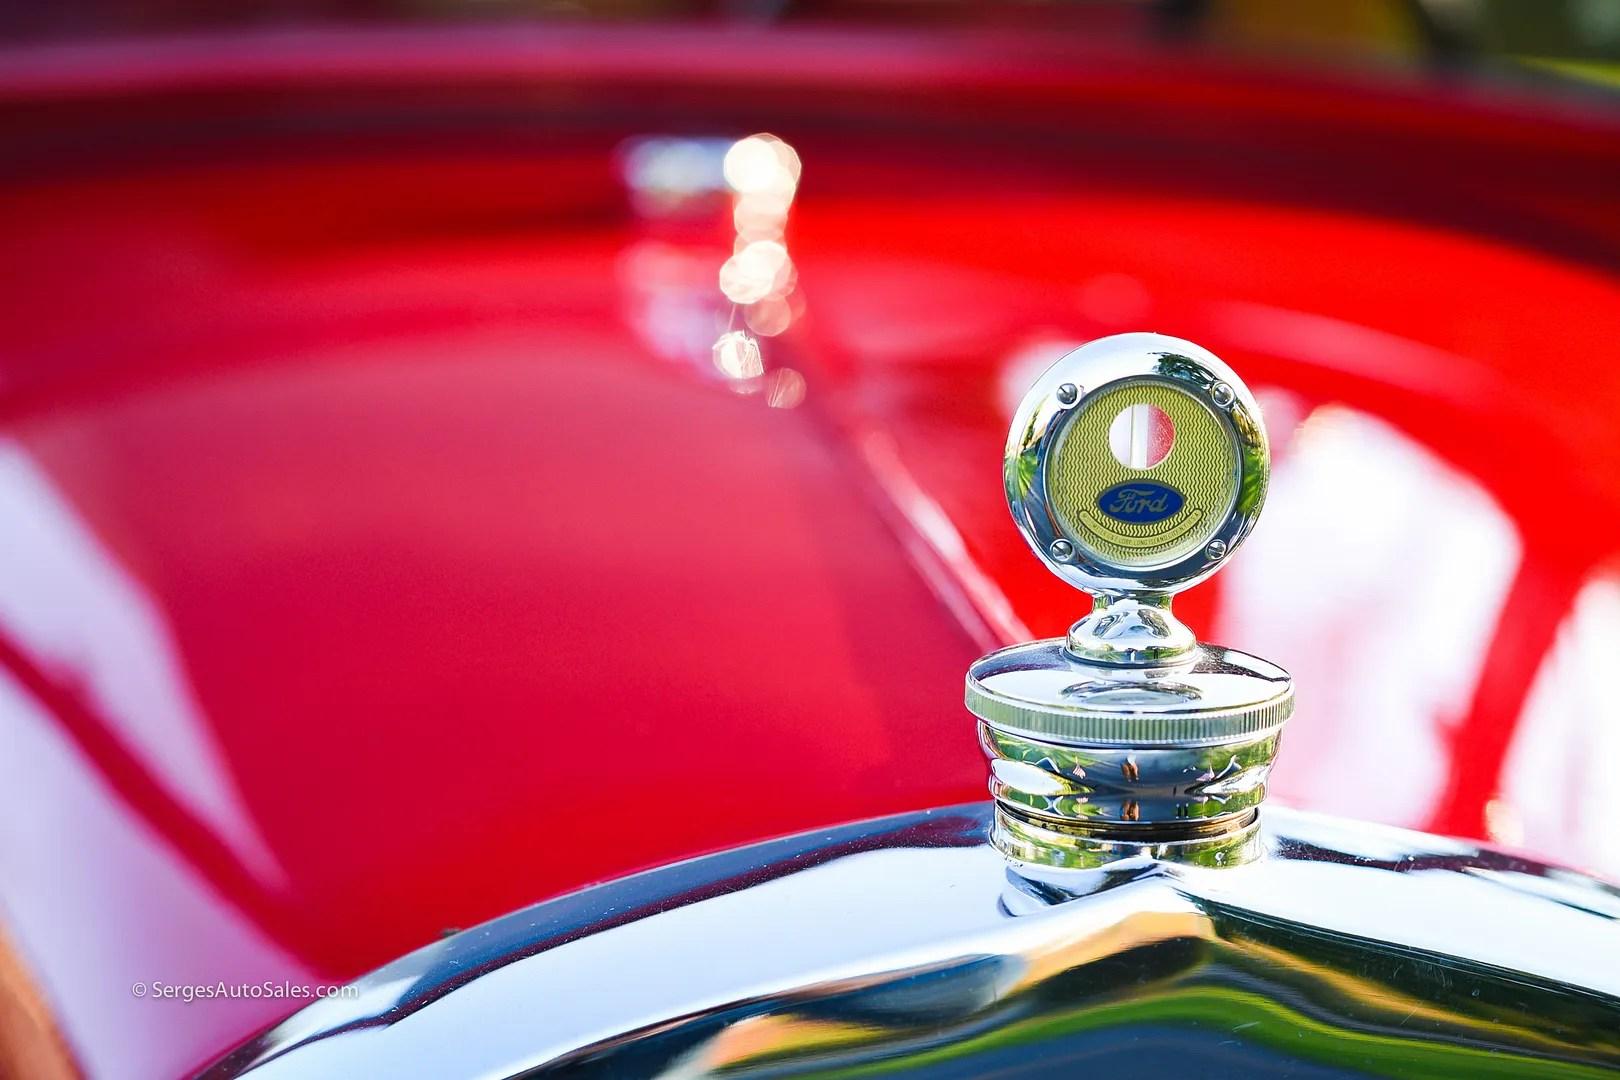 photo 1929-Ford-Model-A-Huckster-for-sale-serges-auto-sales-northeast-pennsylvania-scranton-muscle-cars-corvettes--18_zps2qw4oub0.jpg